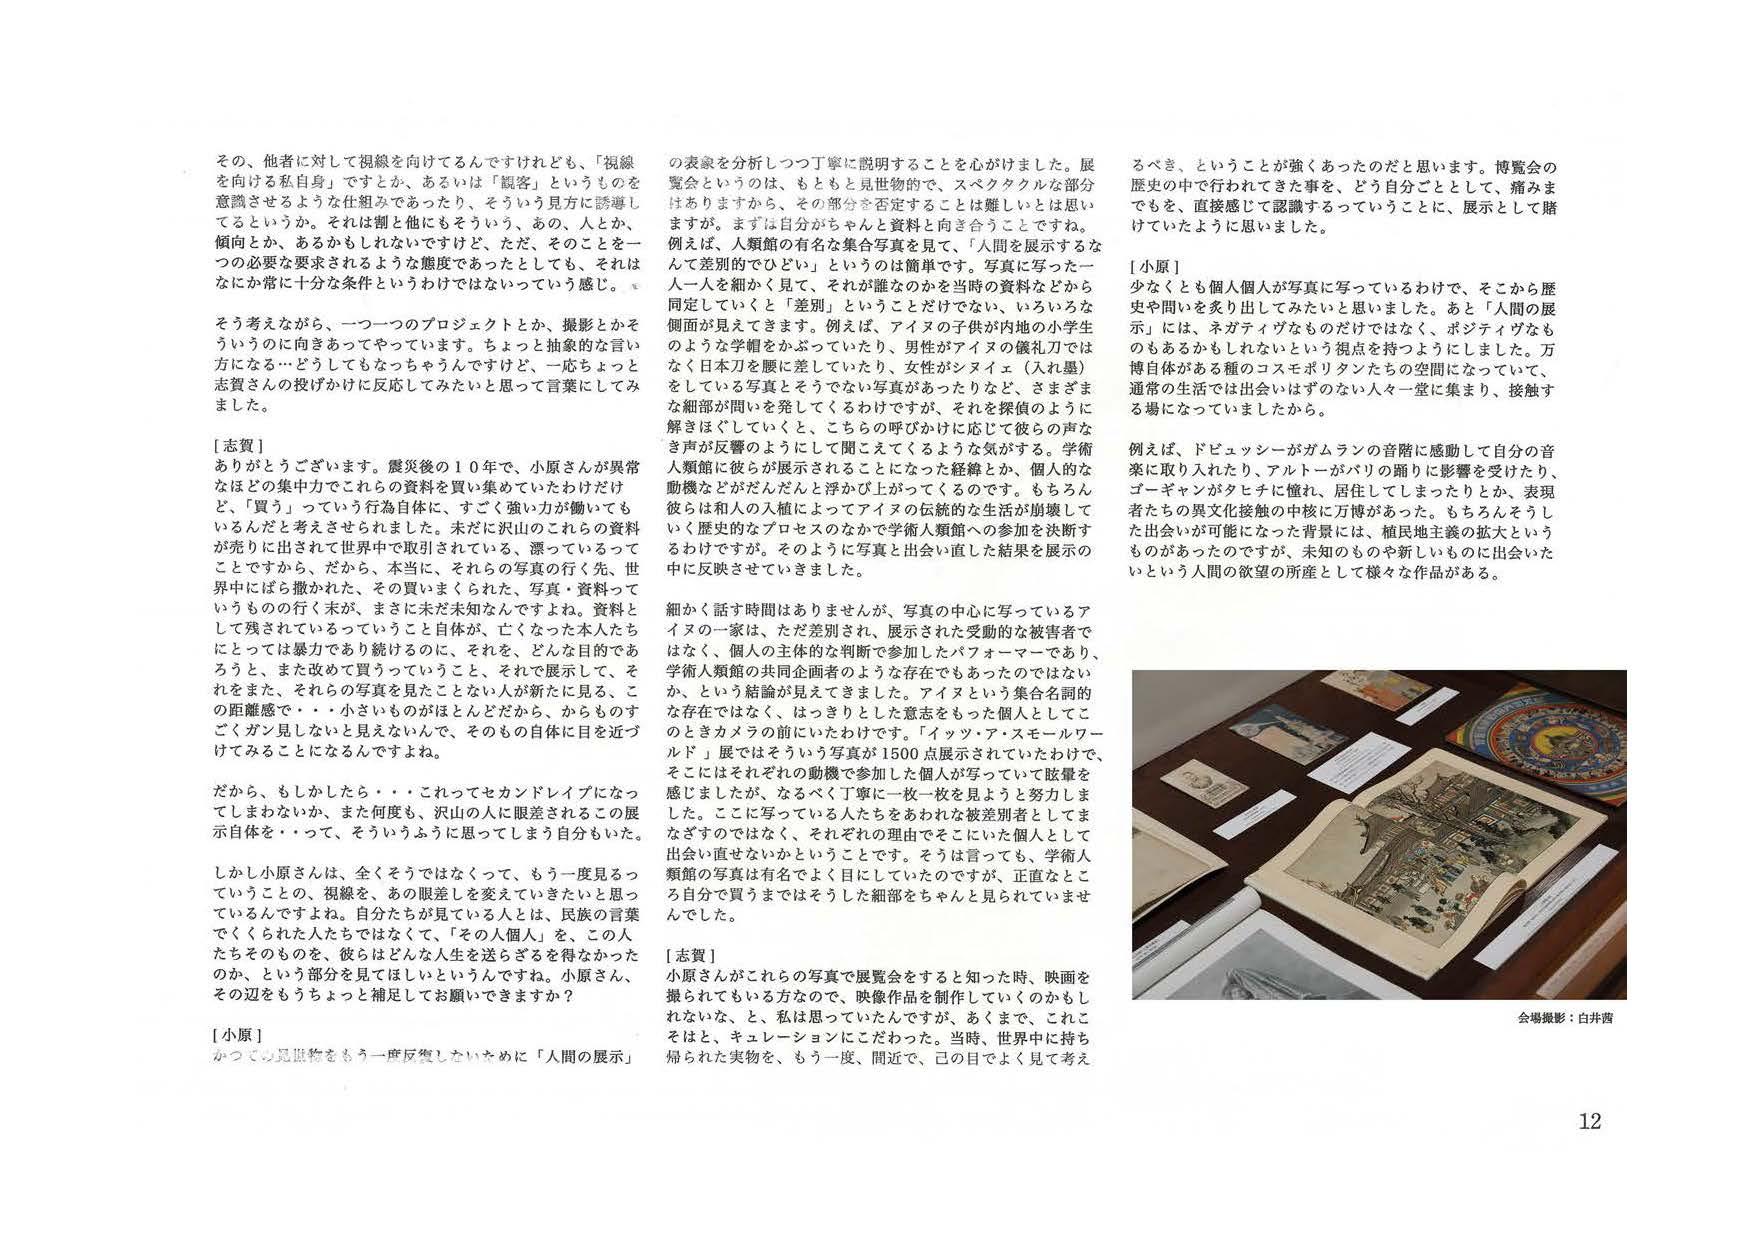 Vol.1 帝国の展示:「イッツ・ア・スモールワールド」展